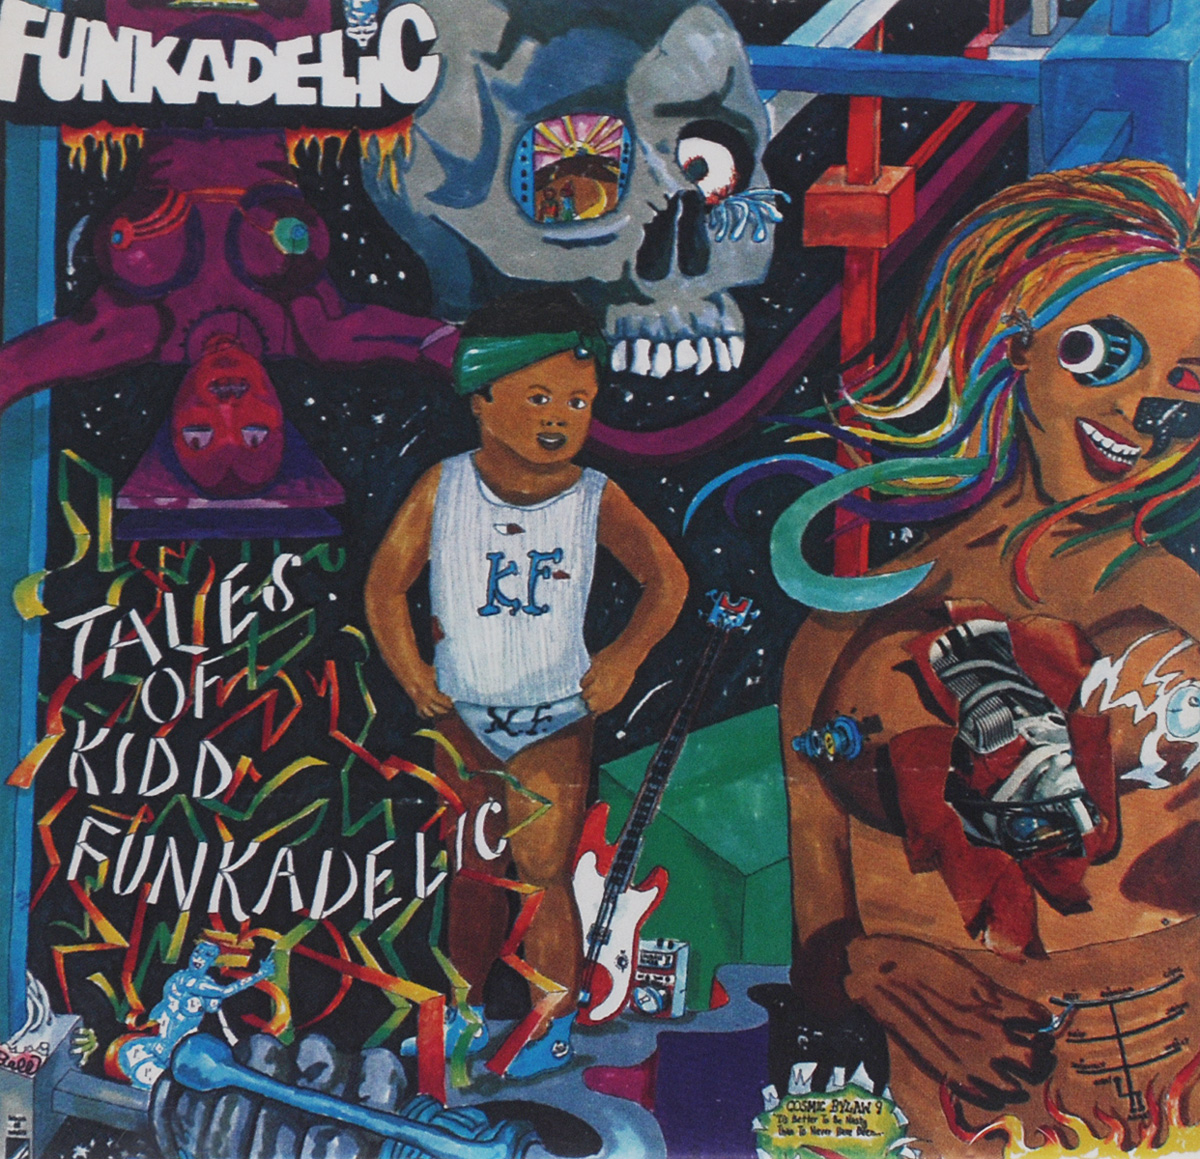 Funkadelic Funkadelic. Tales Of Kidd Funkadelic funkadelic funkadelic standing on the verge the best of funkadelic